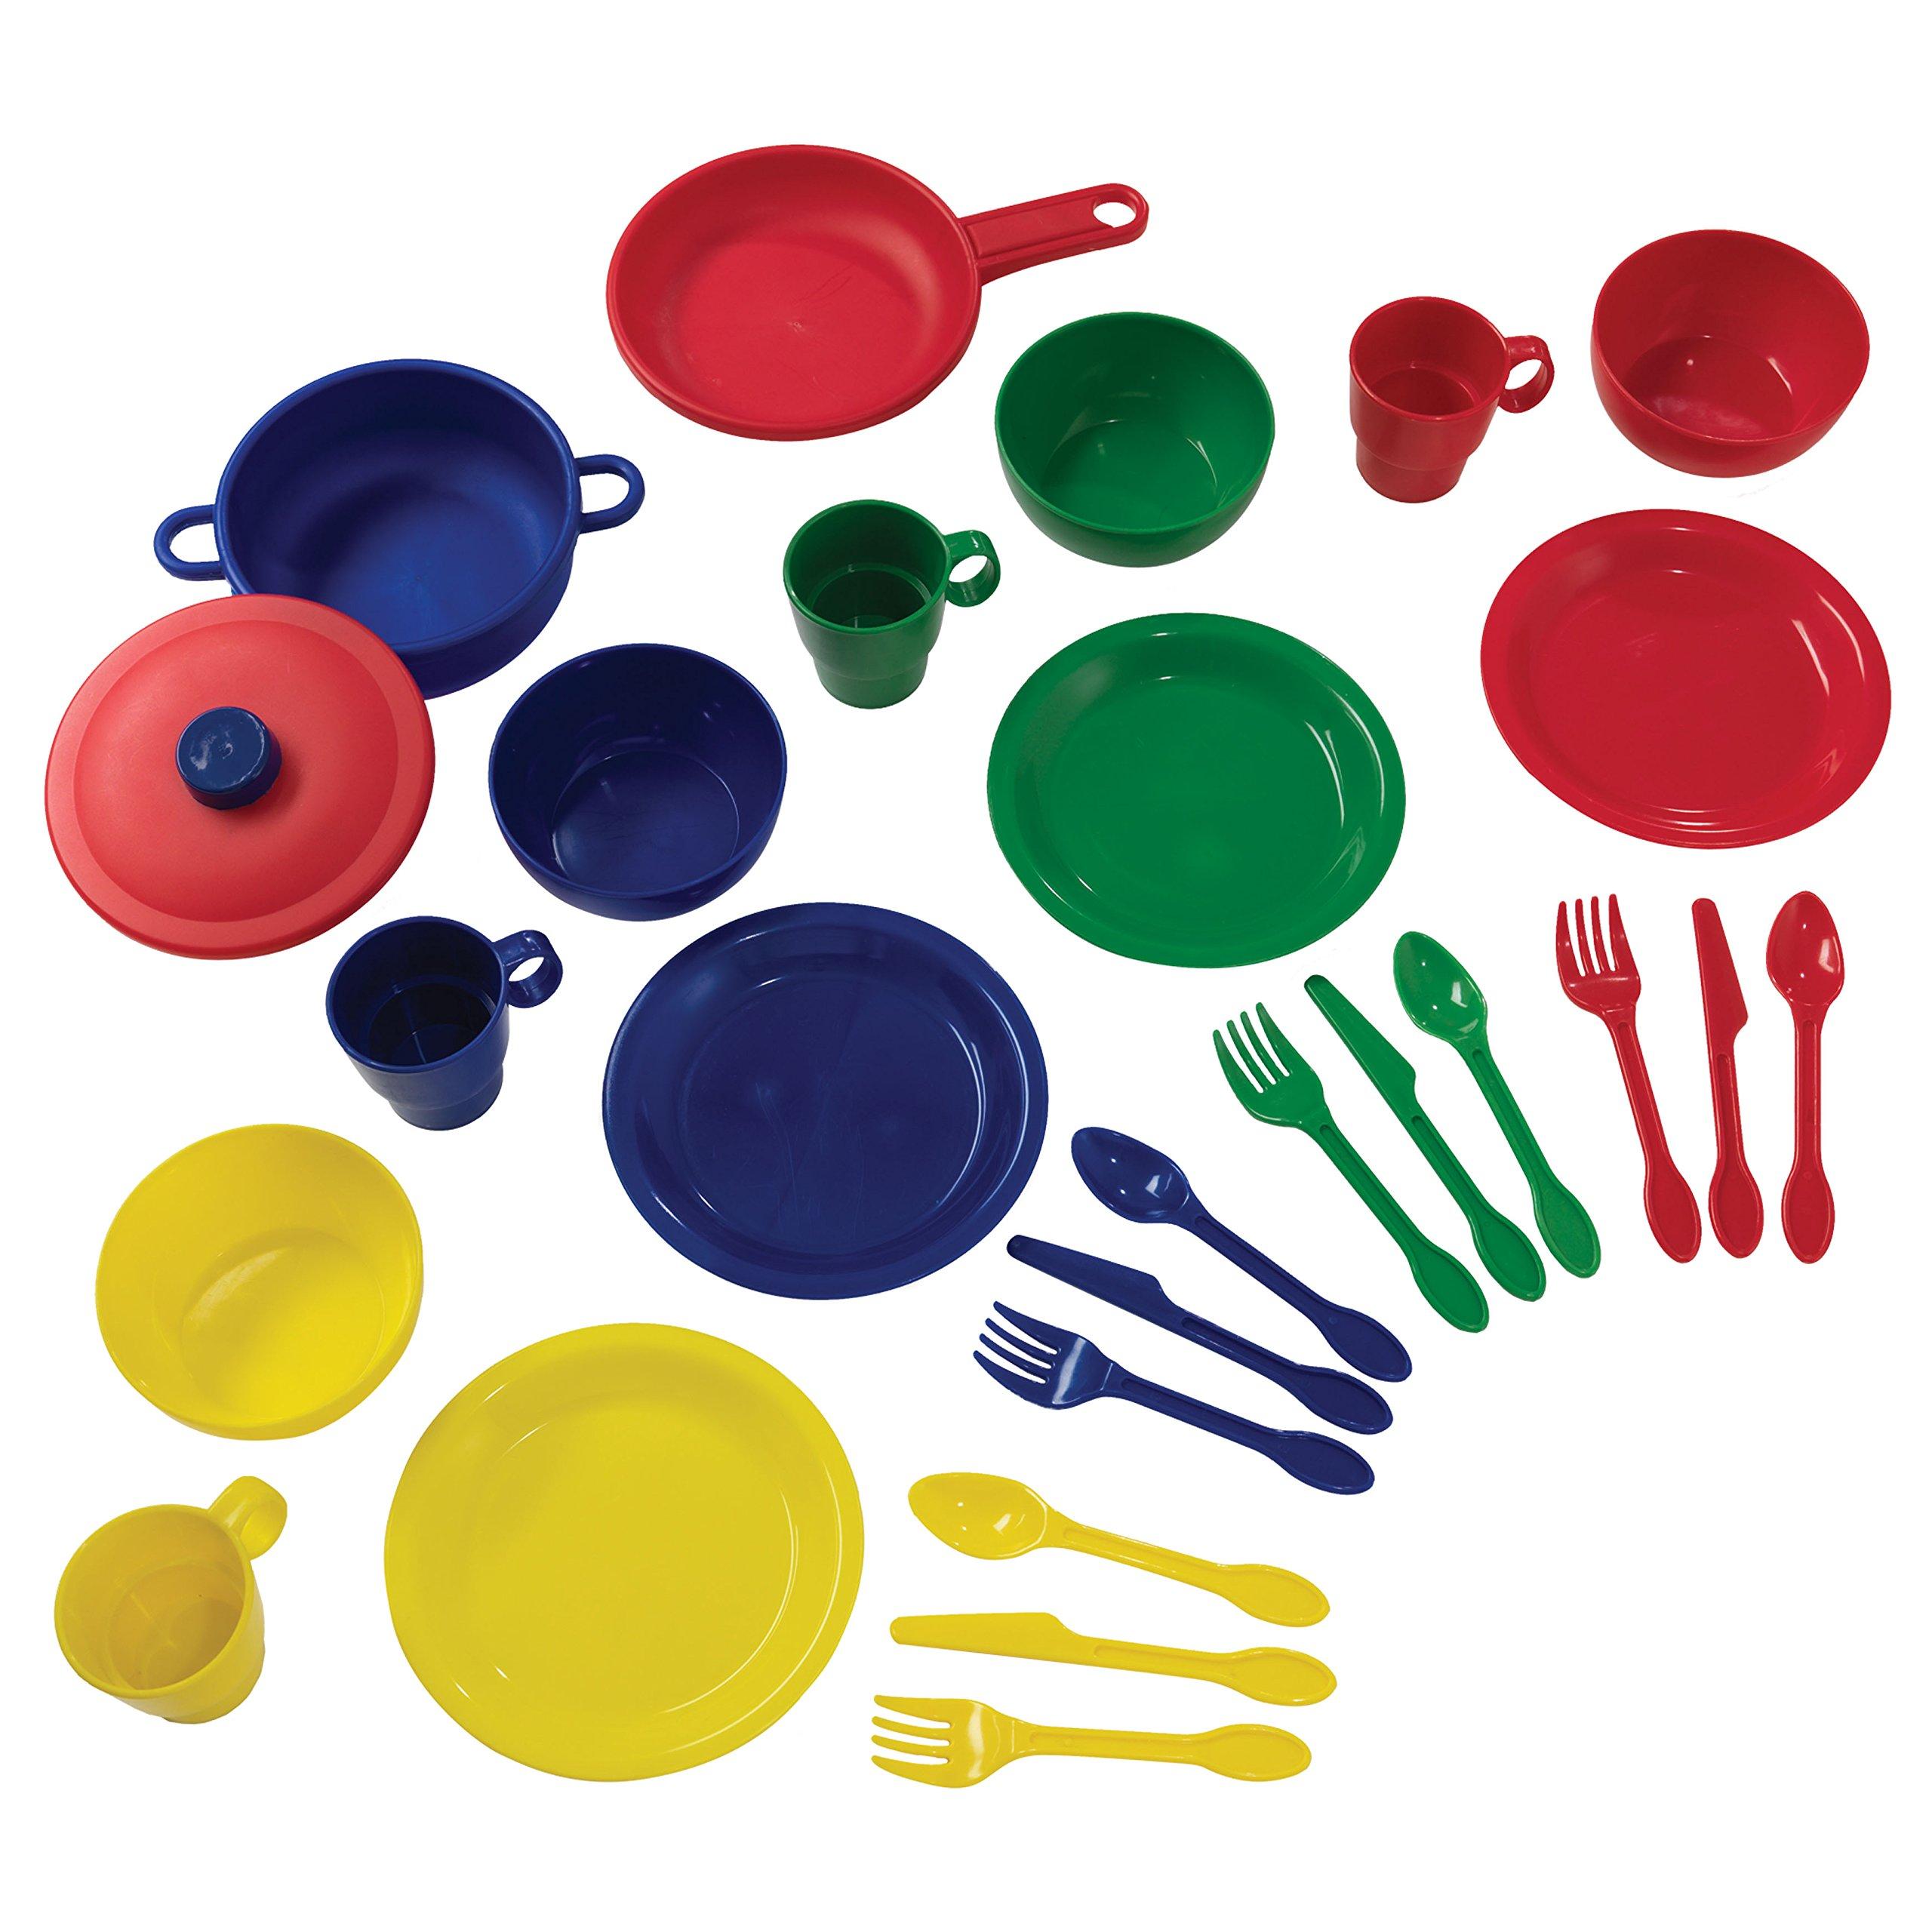 KidKraft 27 Pc Cookware Playset - Primary